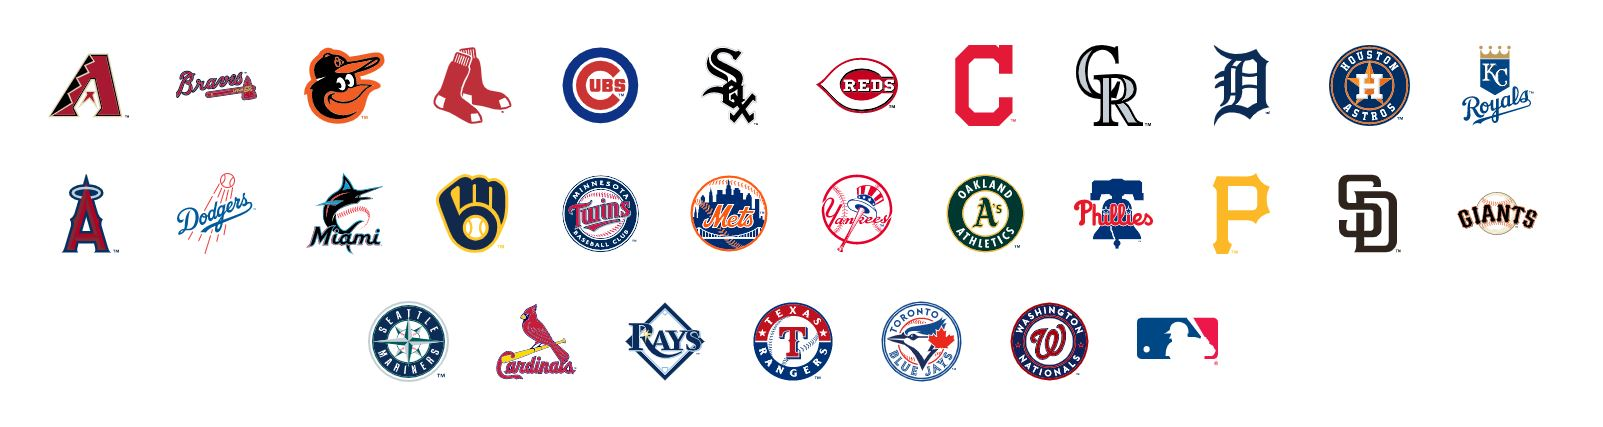 Fanatics MLB Teams